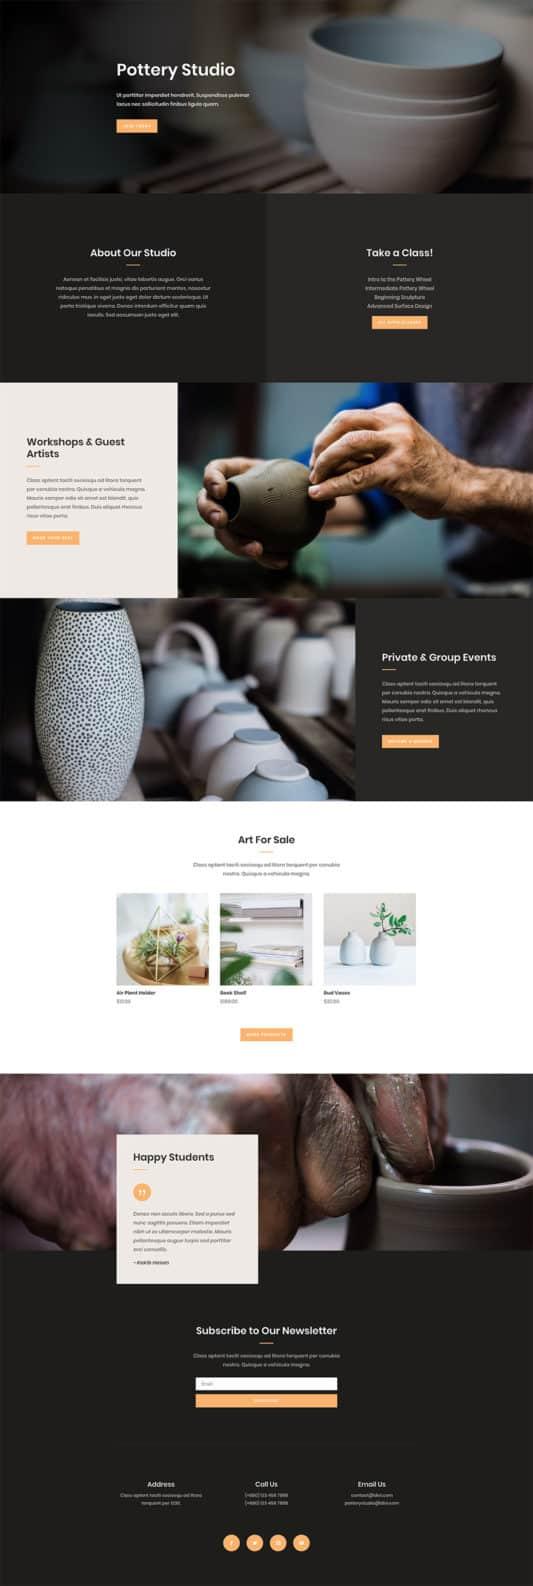 Pottery Studio Web Design 8